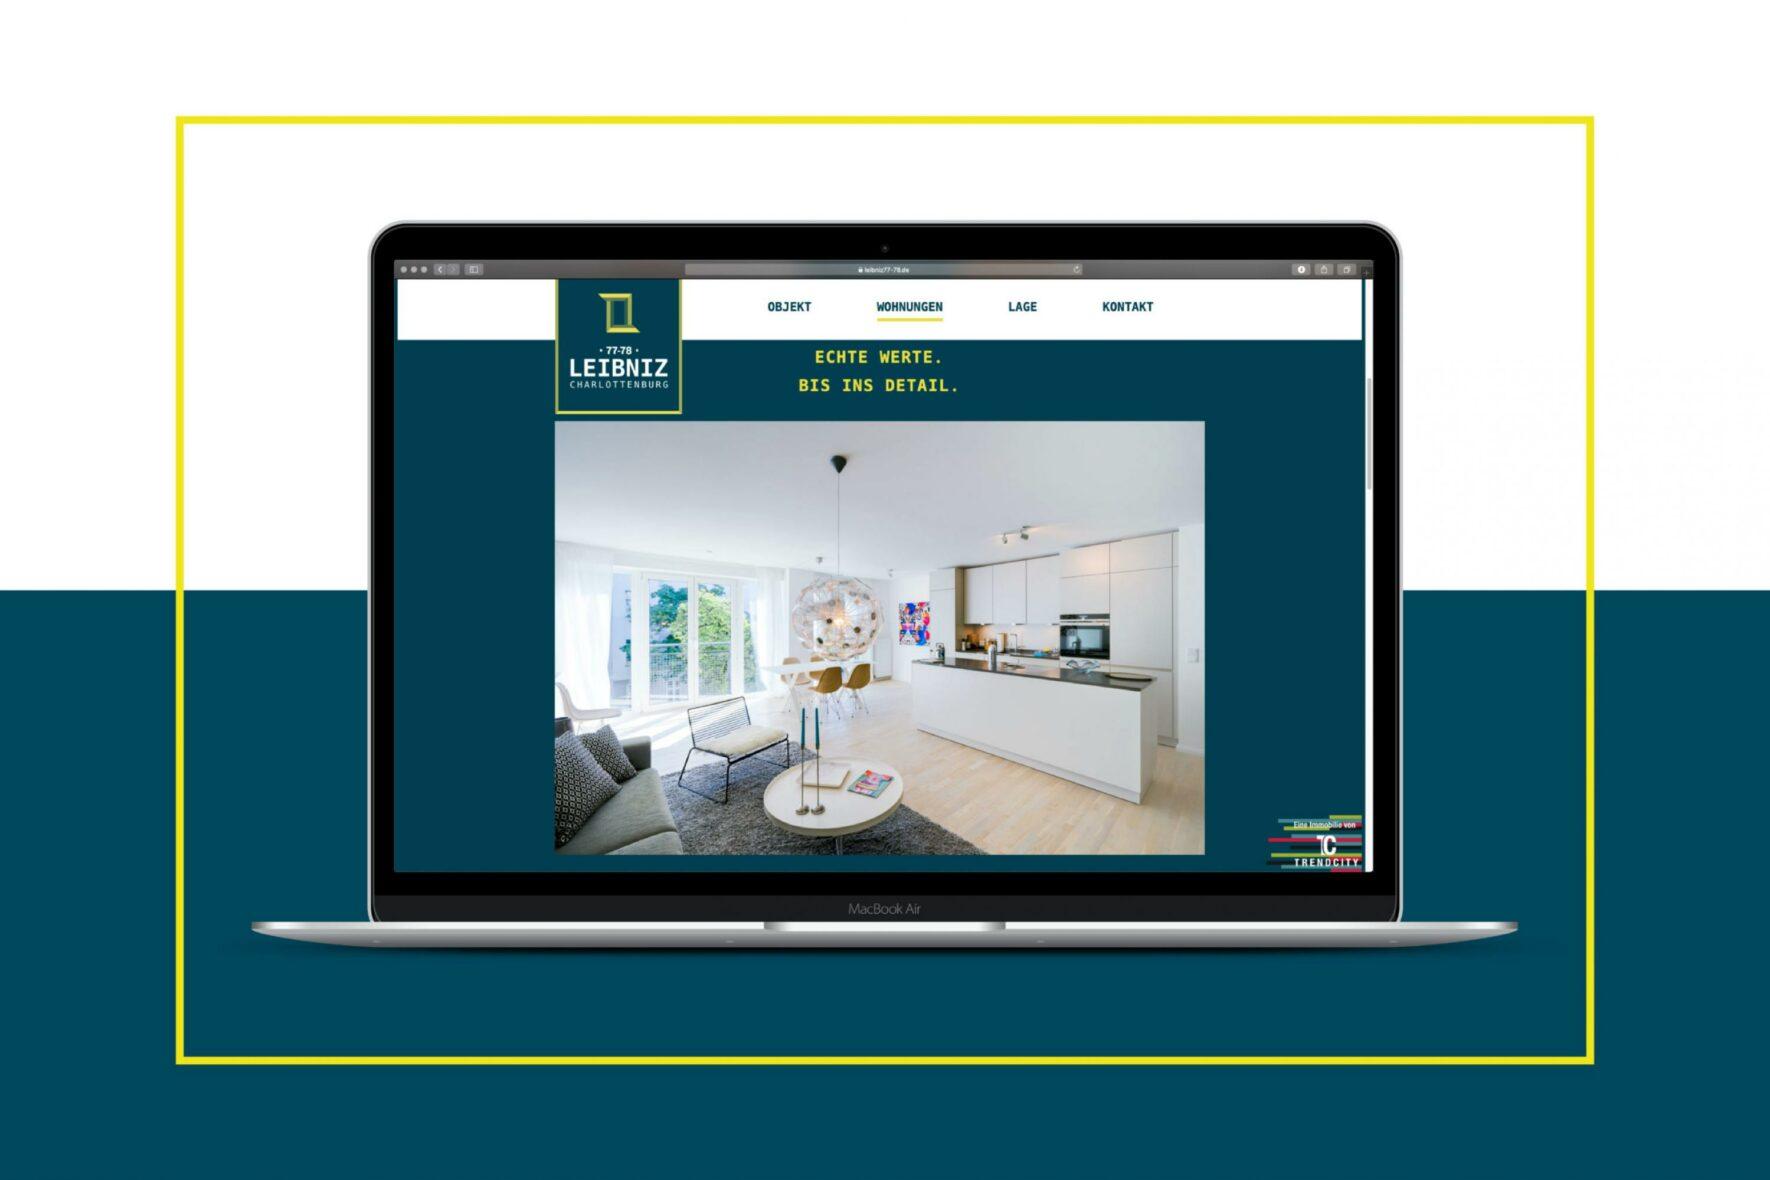 Webdesign-Leibnizstrasse-Trendcity-Immobilien-FORMLOS-Berlin-04